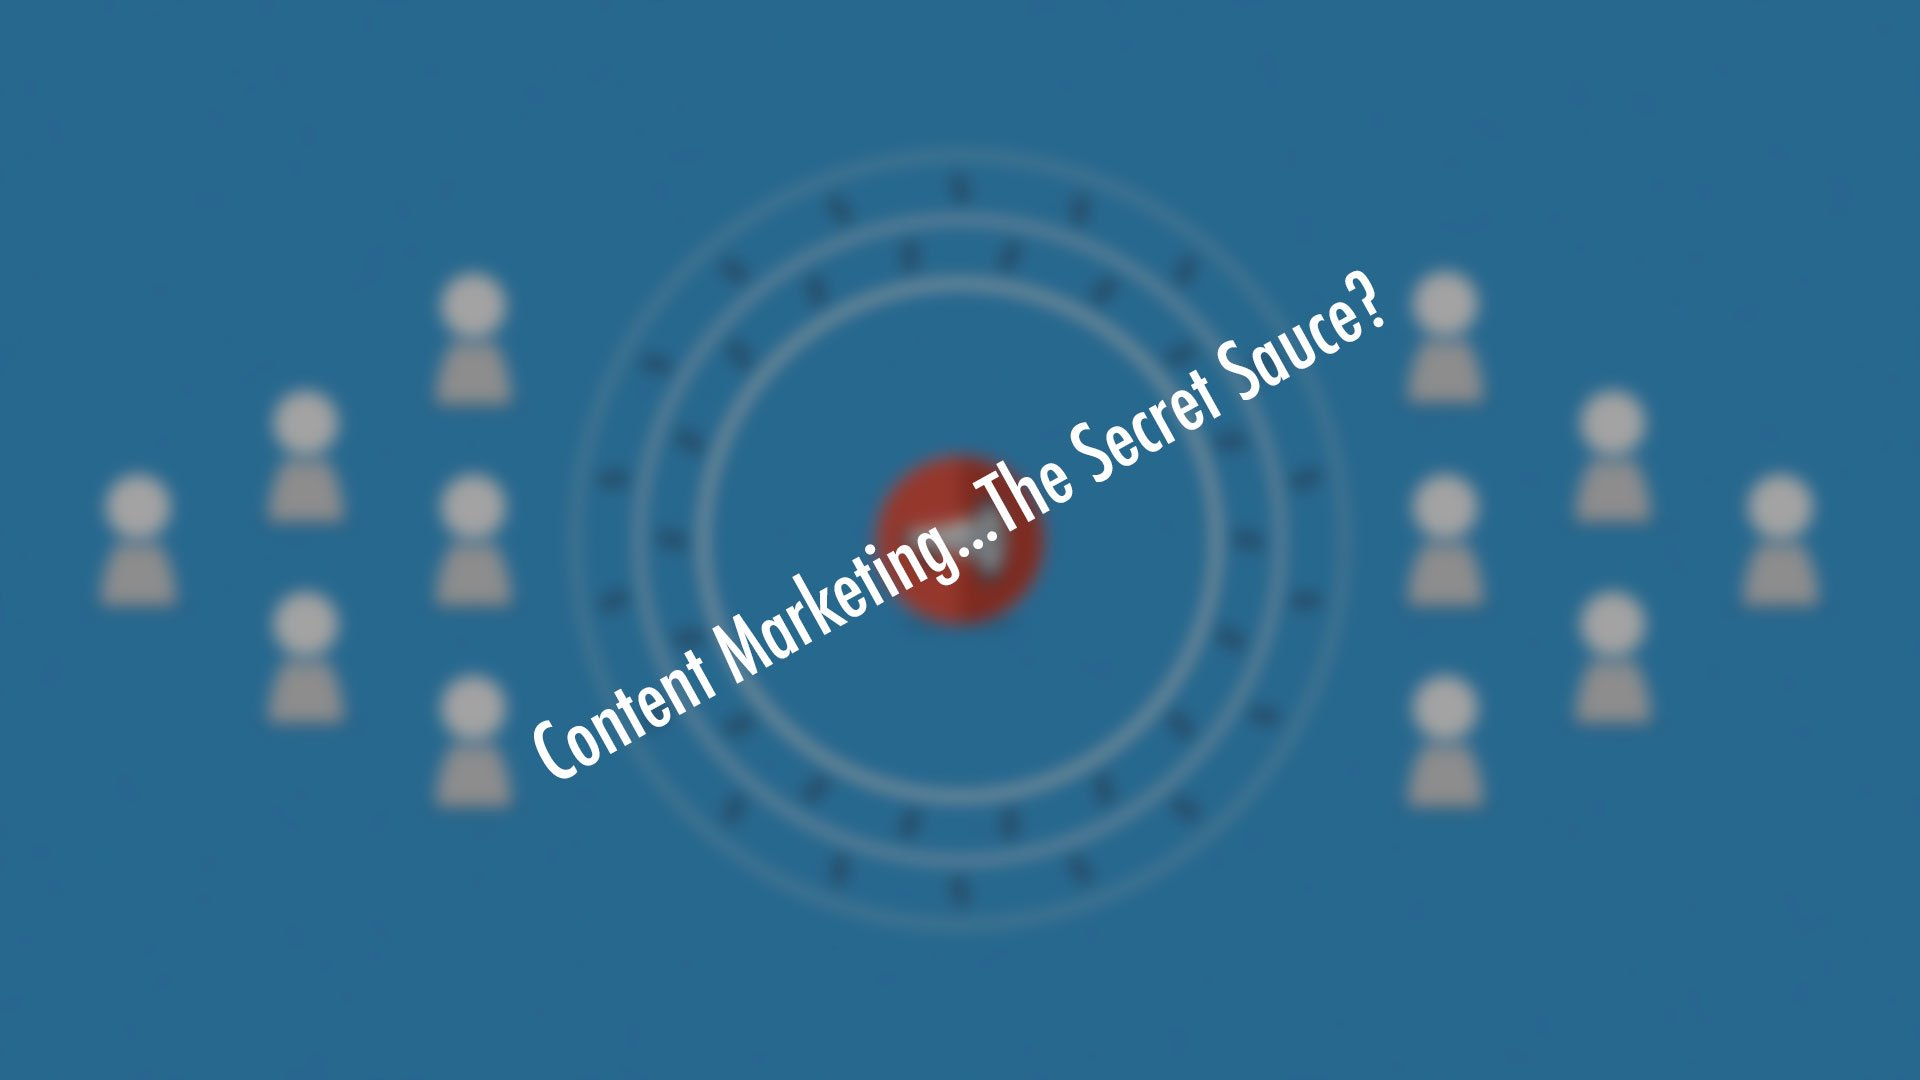 Content-Marketing-video-from-Barnes-Creative-Studios